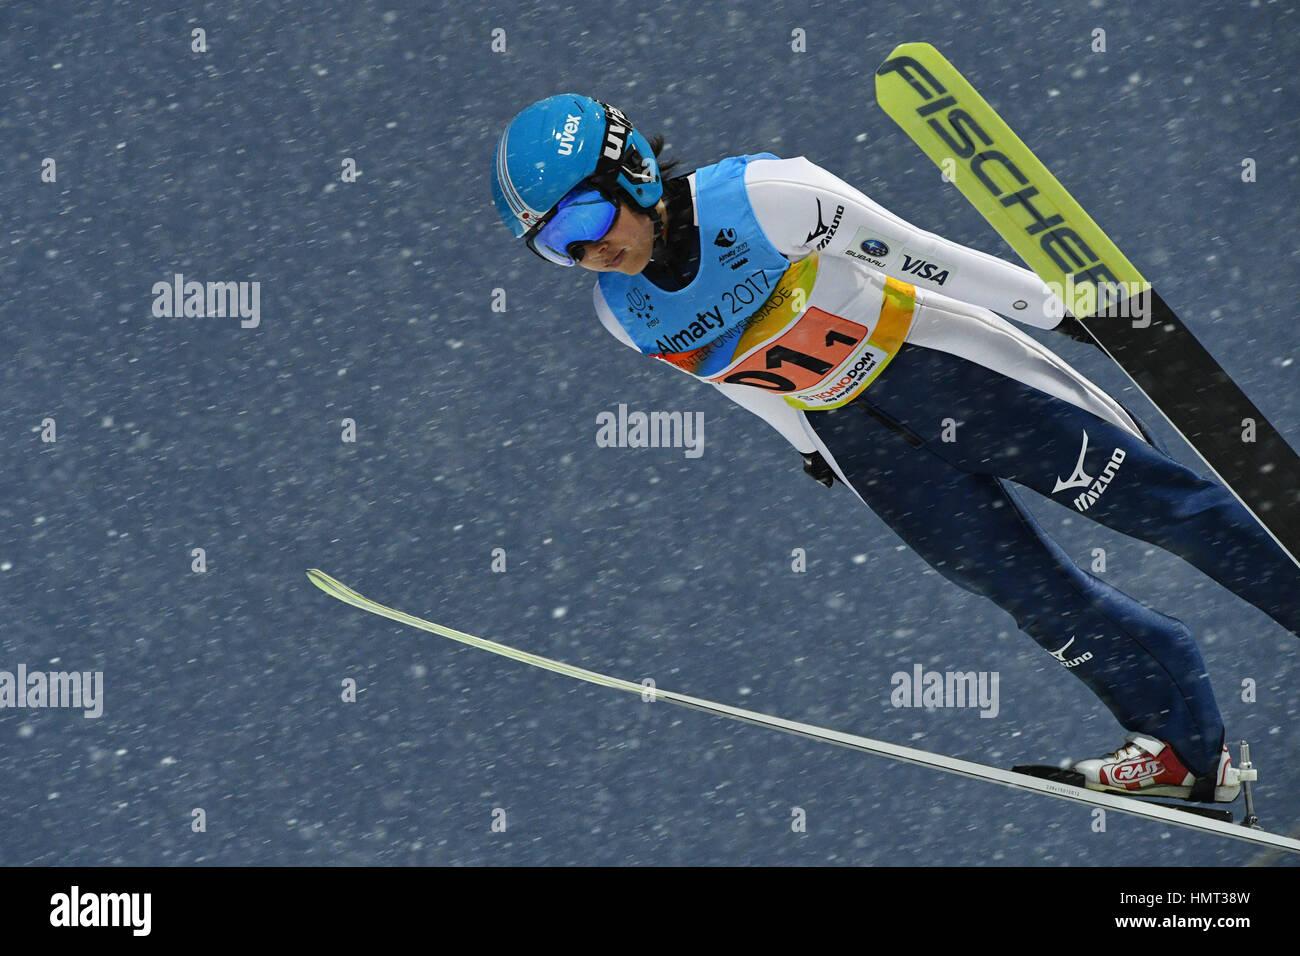 Sunkar International Ski Jumping complessa, Almaty, Kazakhstan. 4 febbraio, 2017. Jun Maruyama (JPN), 4 febbraioFoto Stock